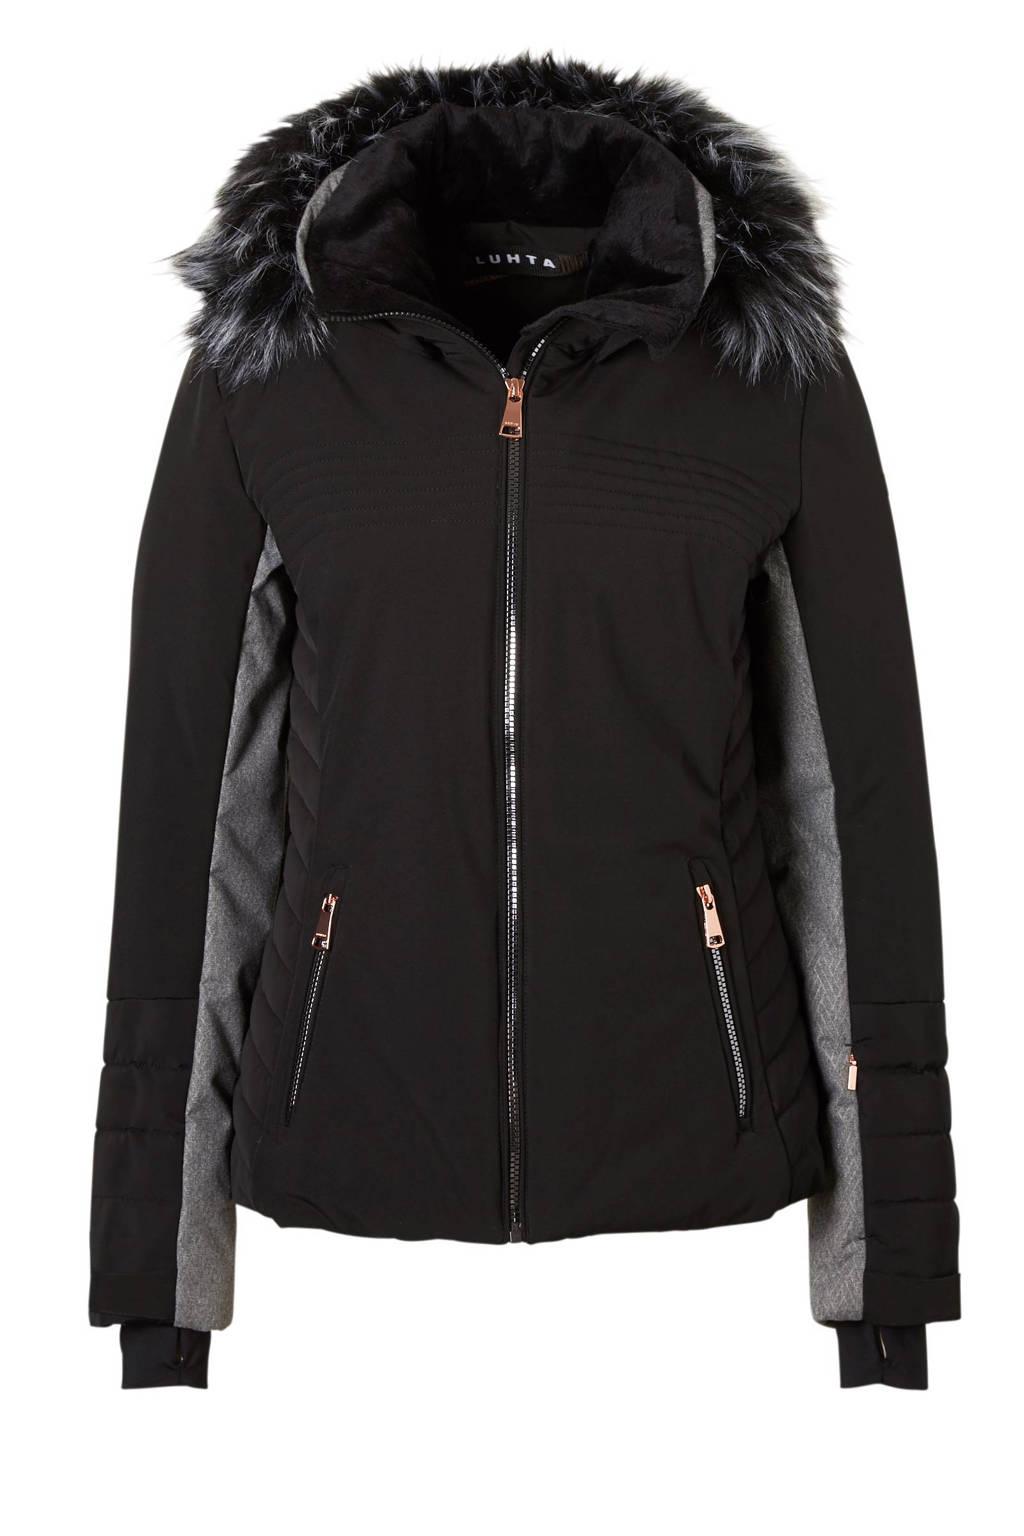 Luhta ski-jack Berit zwart, Zwart/koper